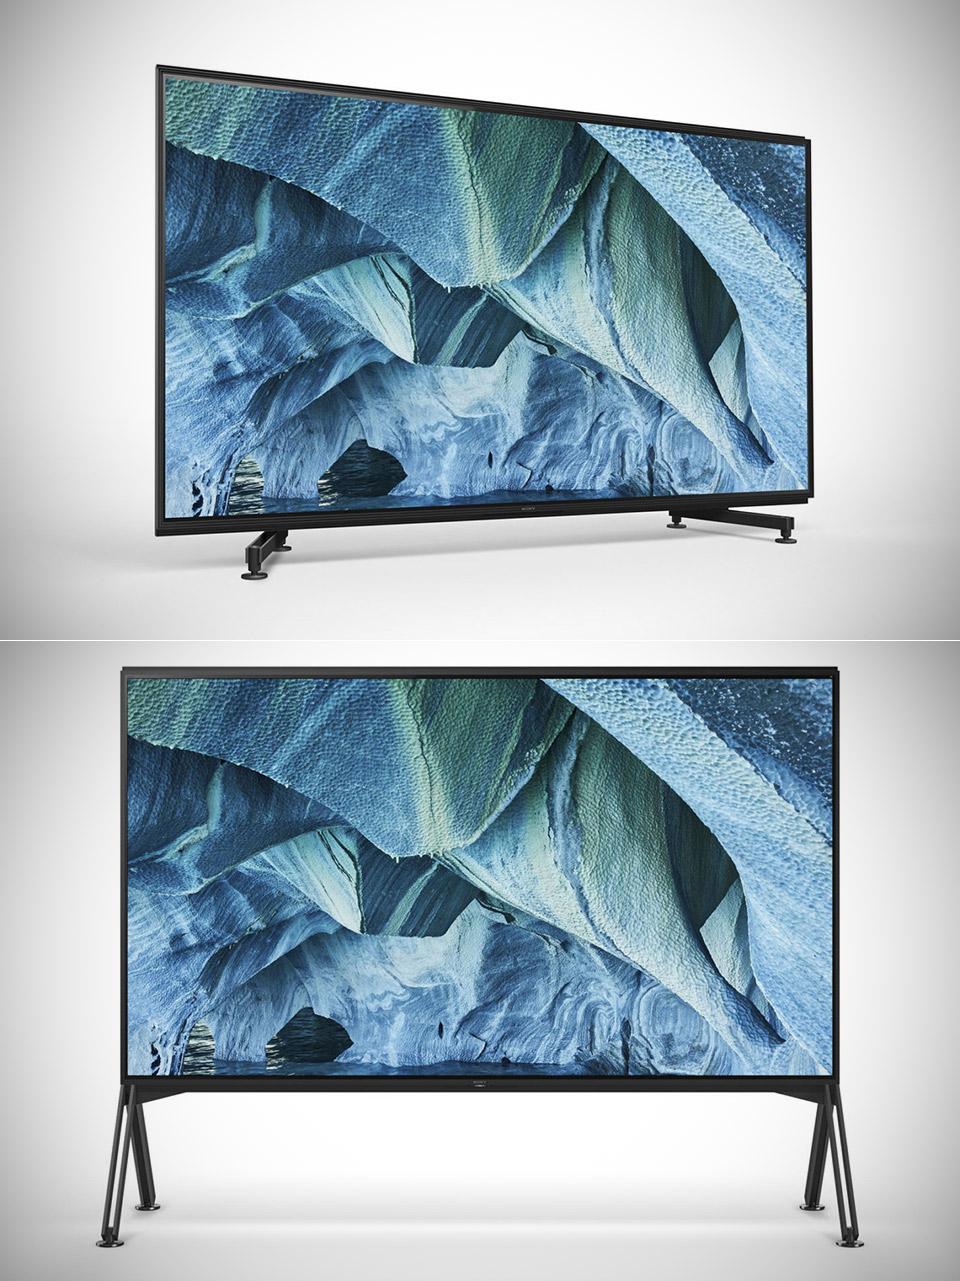 Sony BRAVIA 8K Resolution TV